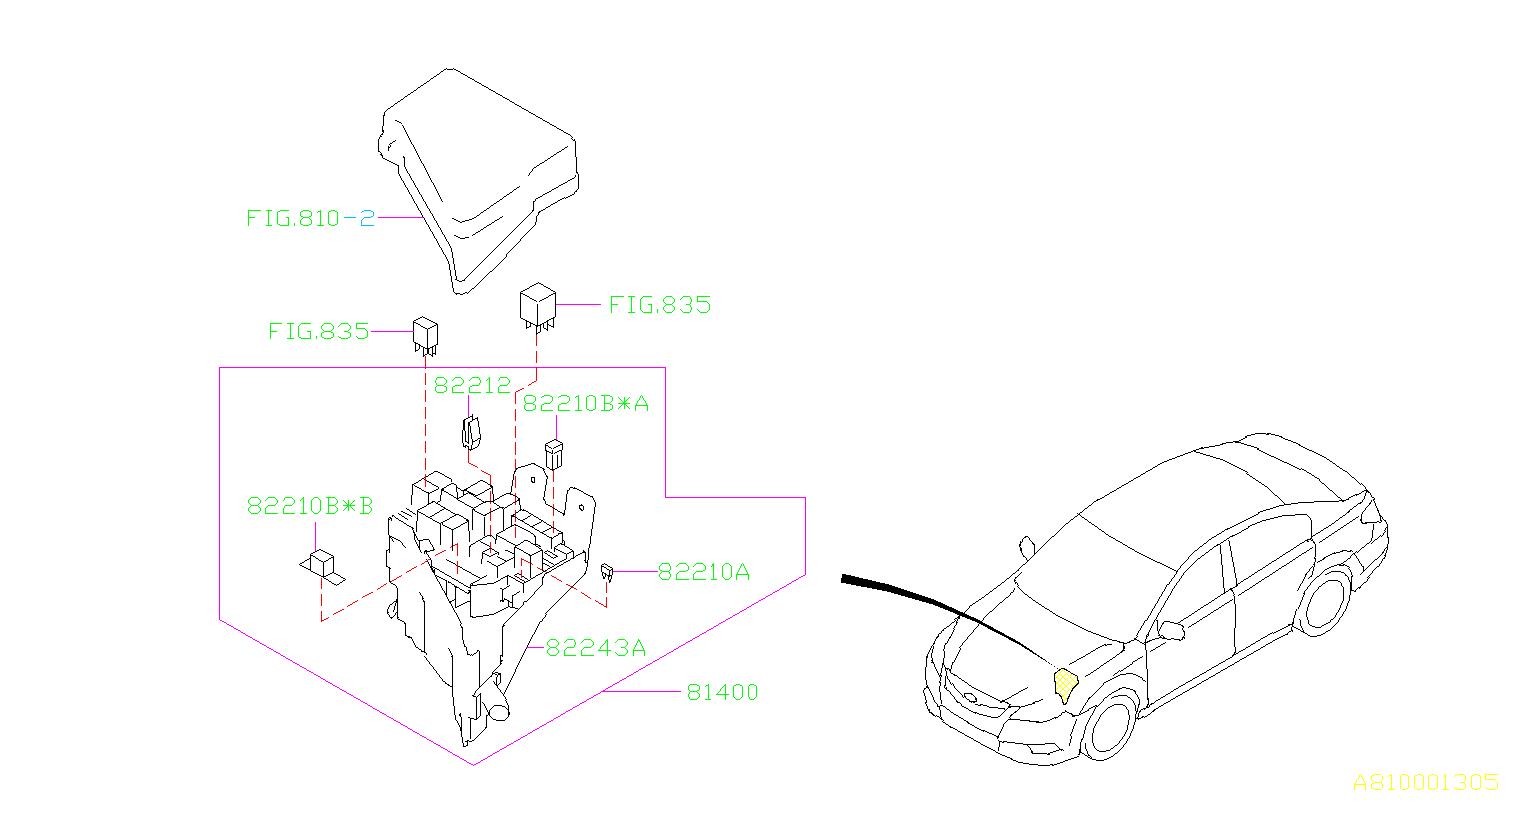 tags: #subaru fuse box diagrams#subaru impreza wrx fuse box#2003 subaru  forester fuse box location#subaru forester fuse box diagram#1998 subaru  forester